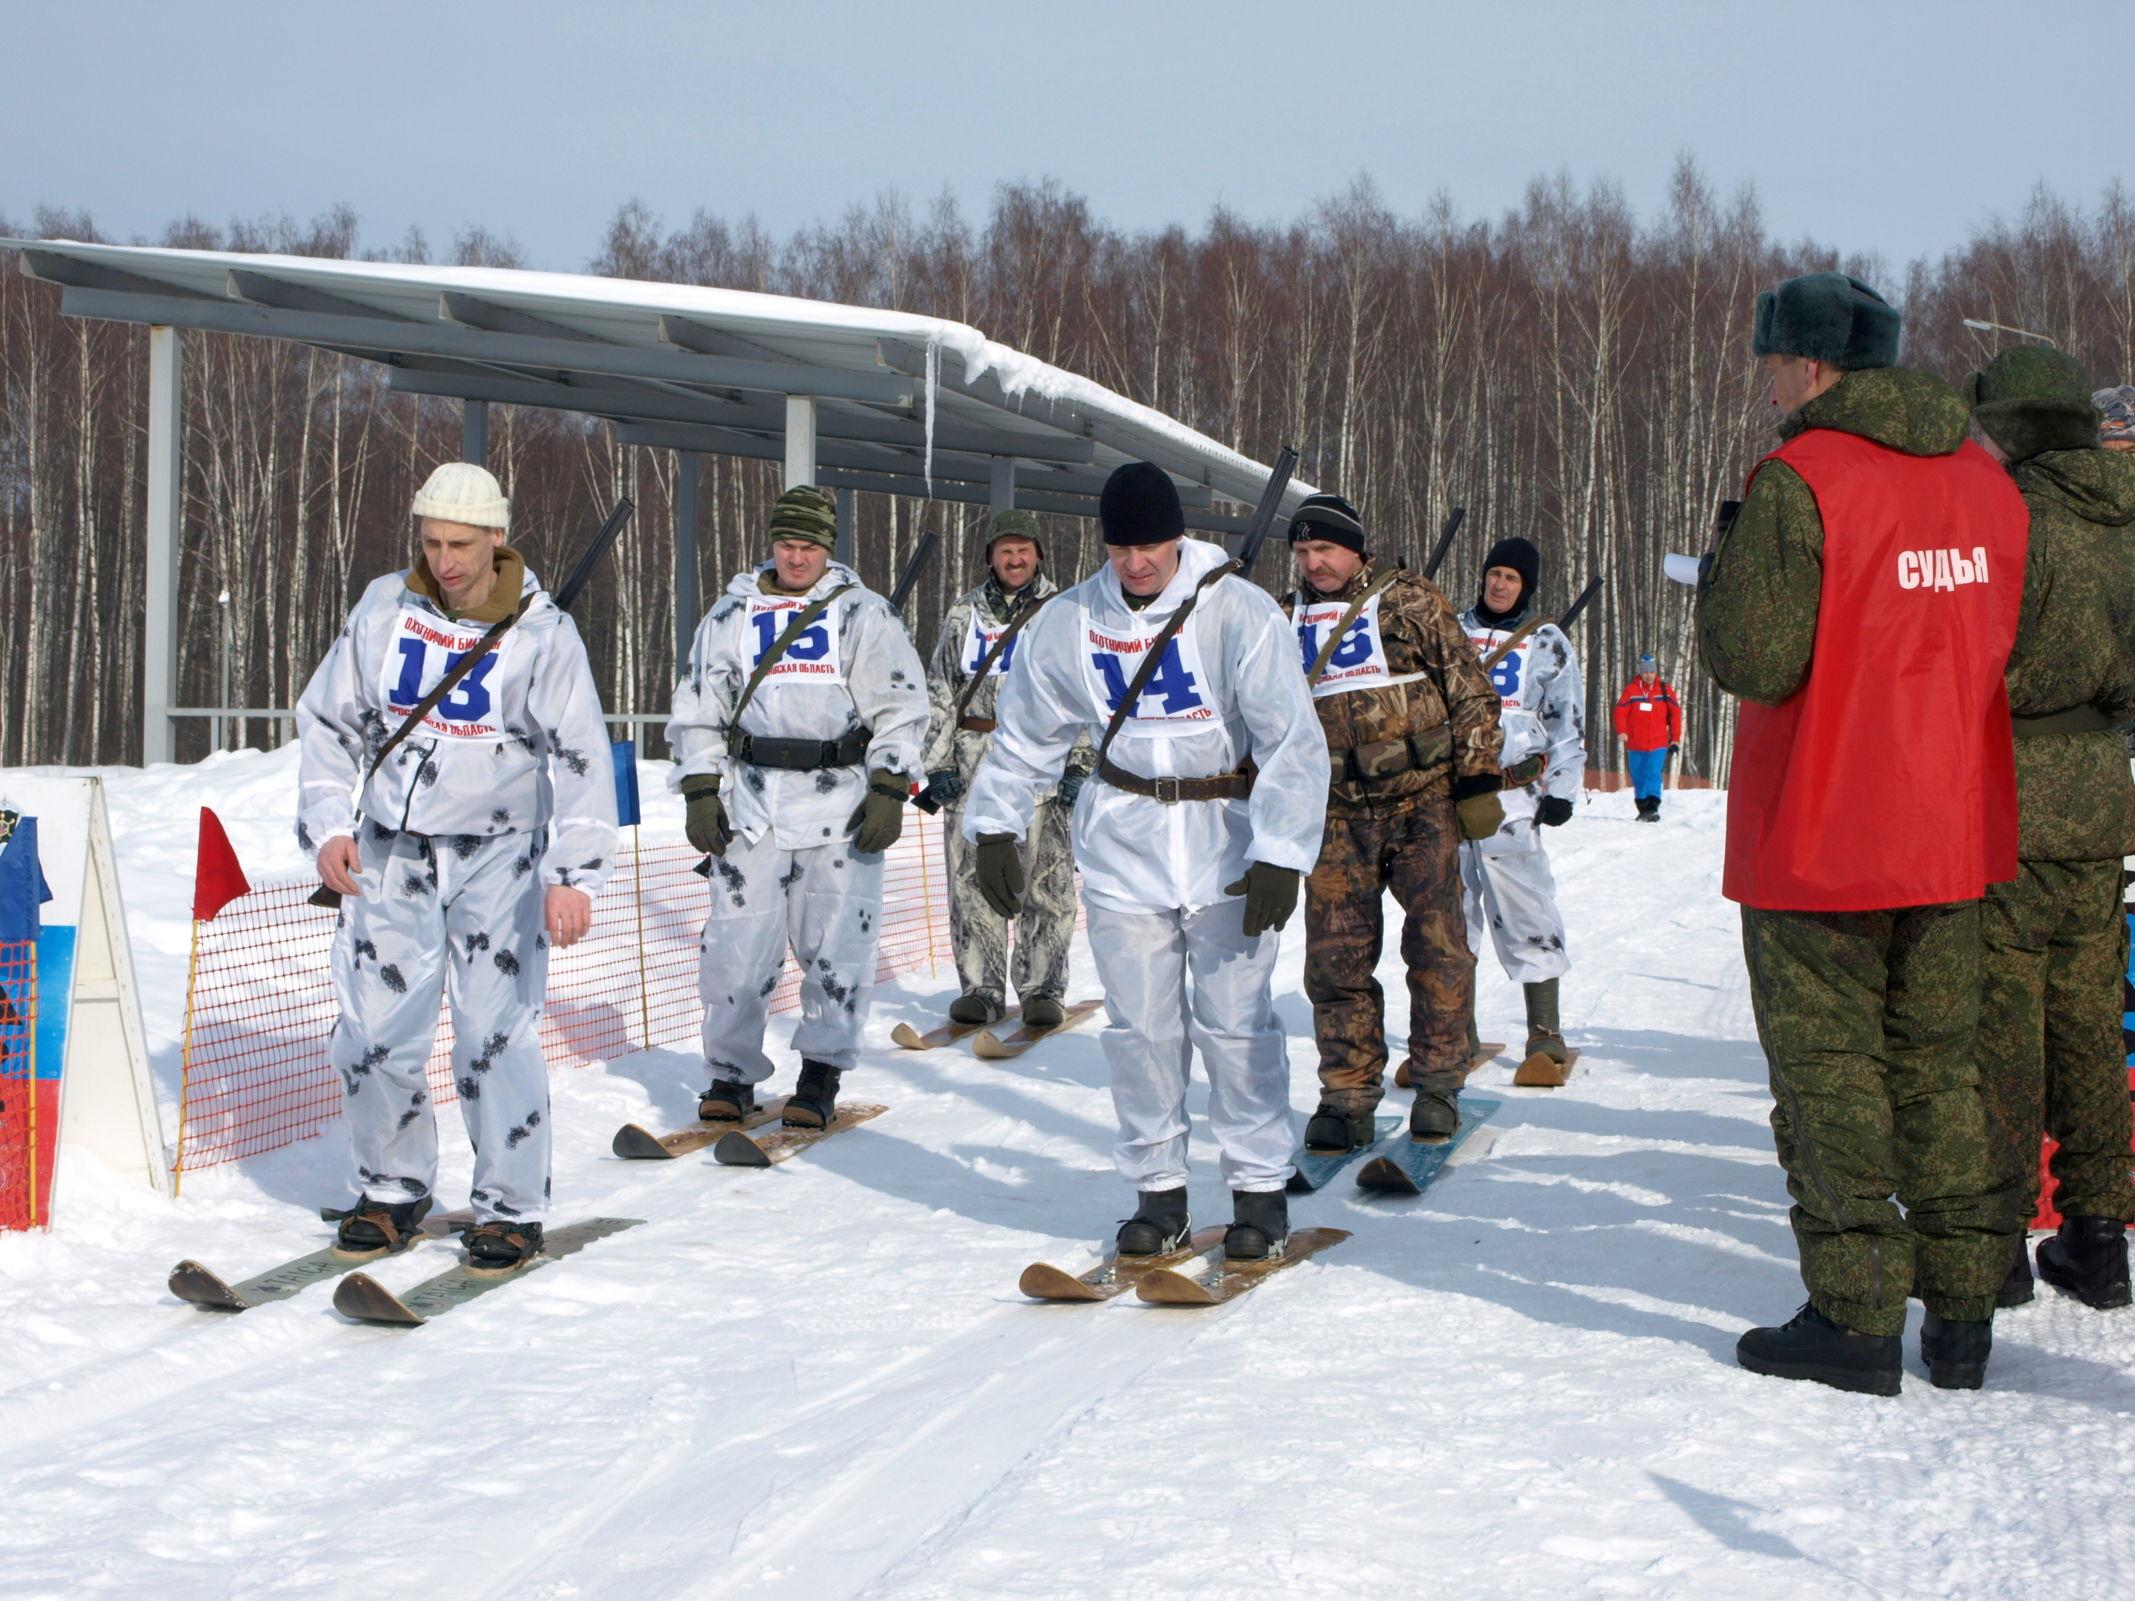 В рамках чемпионата по охотничьему биатлону предприятия области представят инновационную технику